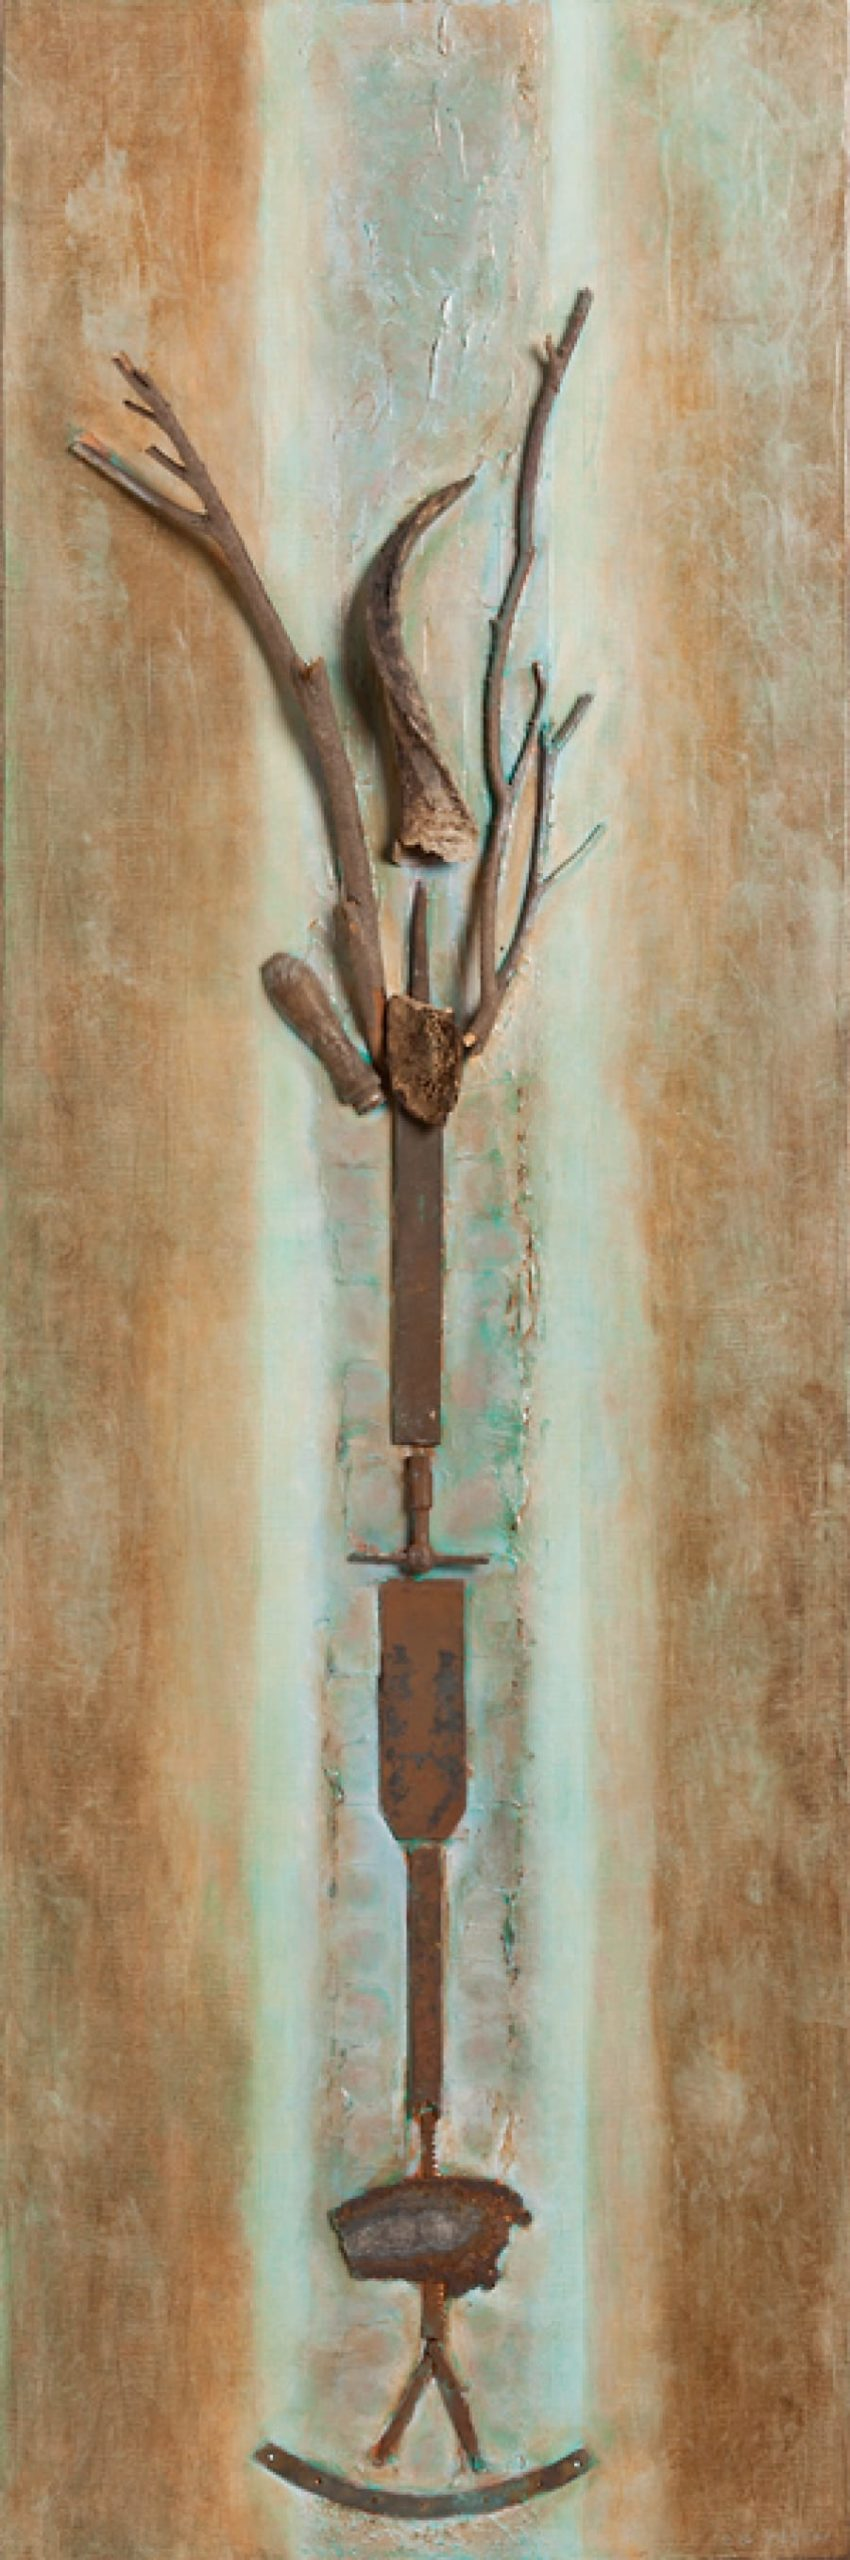 Kunst: Offer van kunstenaar Els Vegter